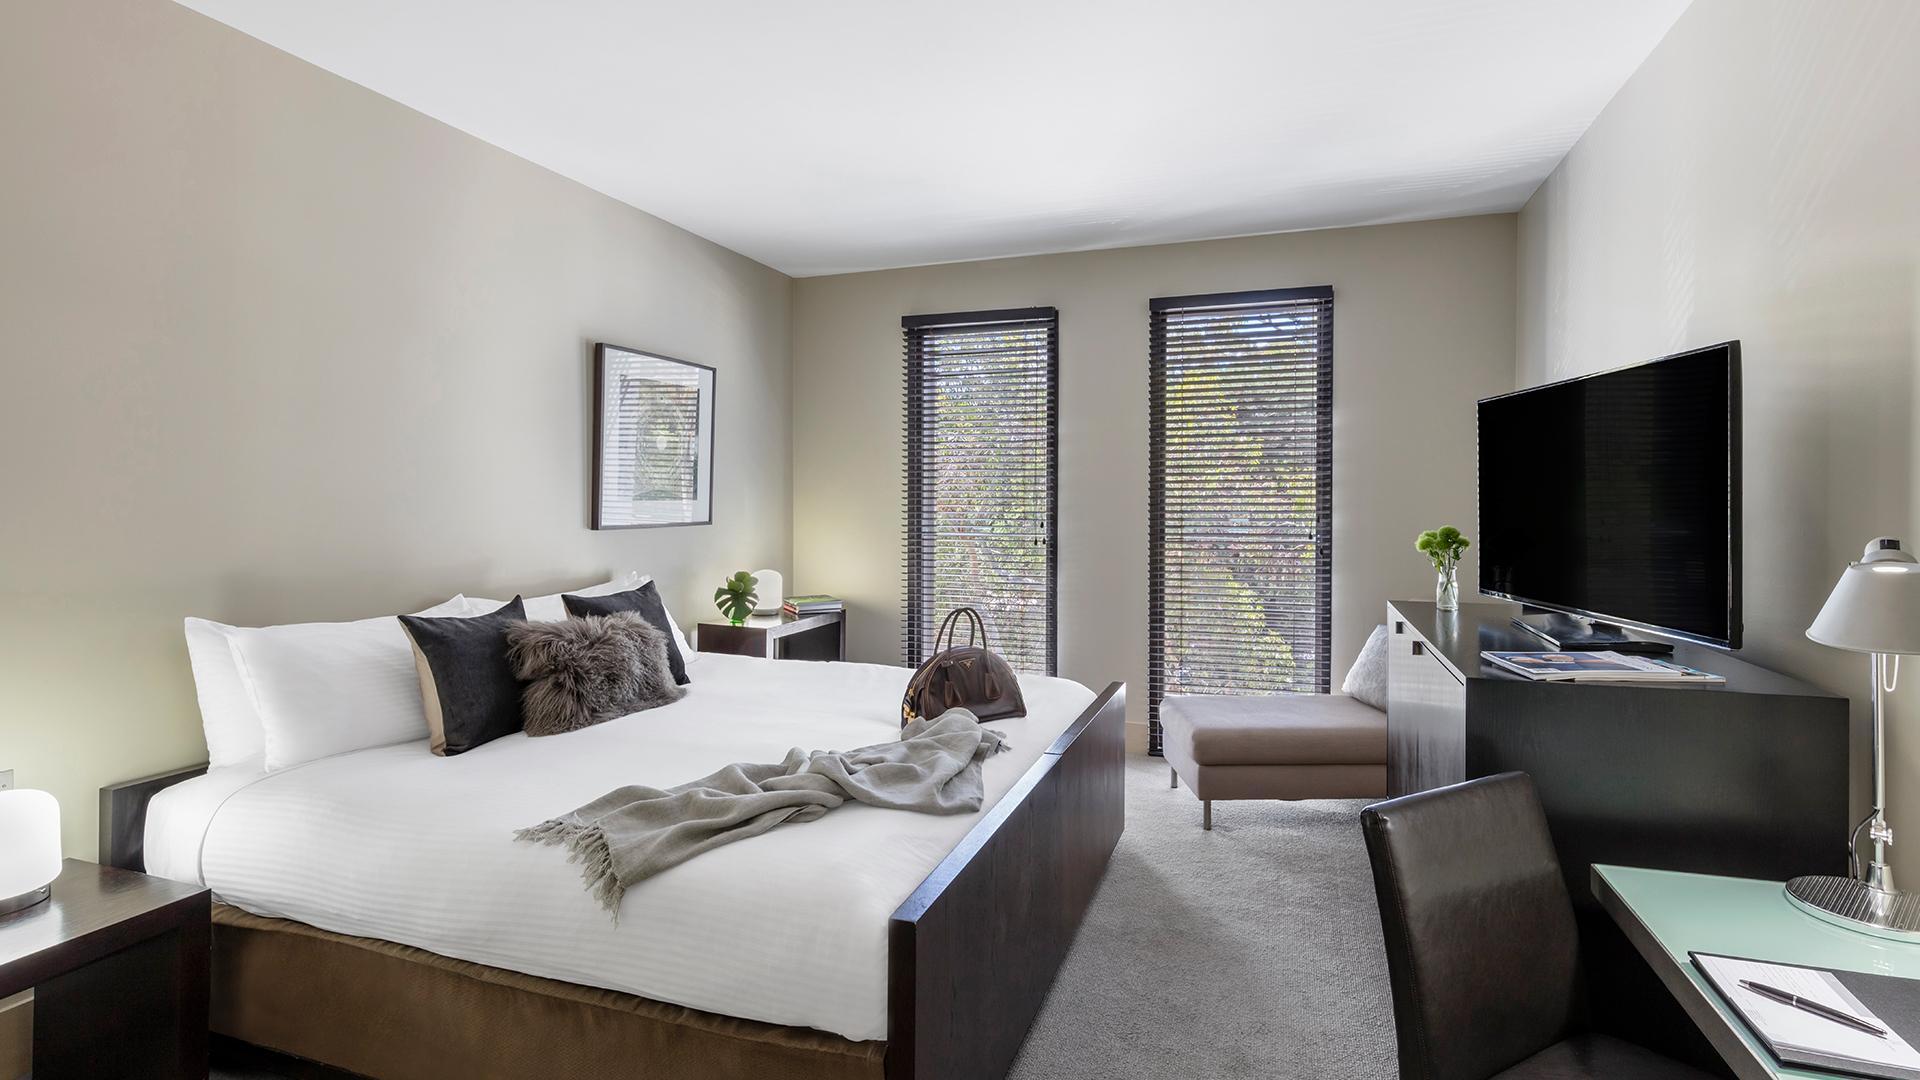 Superior Room image 1 at Lancemore Mansion Hotel Werribee Park by City of Wyndham, Victoria, Australia